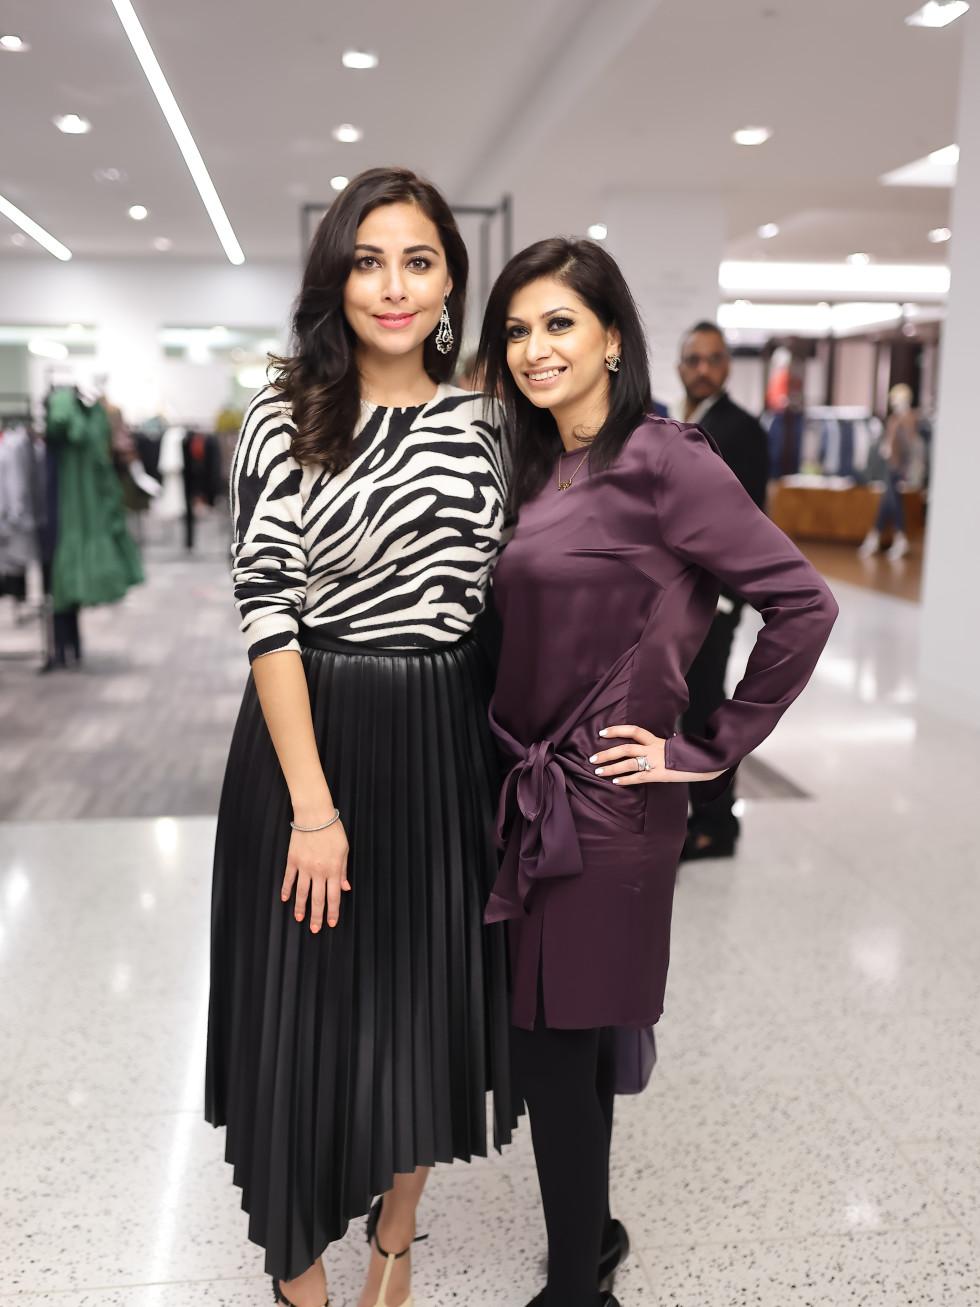 LCA Houston Winter Spring Power Couples 2021 Correa Sheekha Khan and Sadaf Choudhury